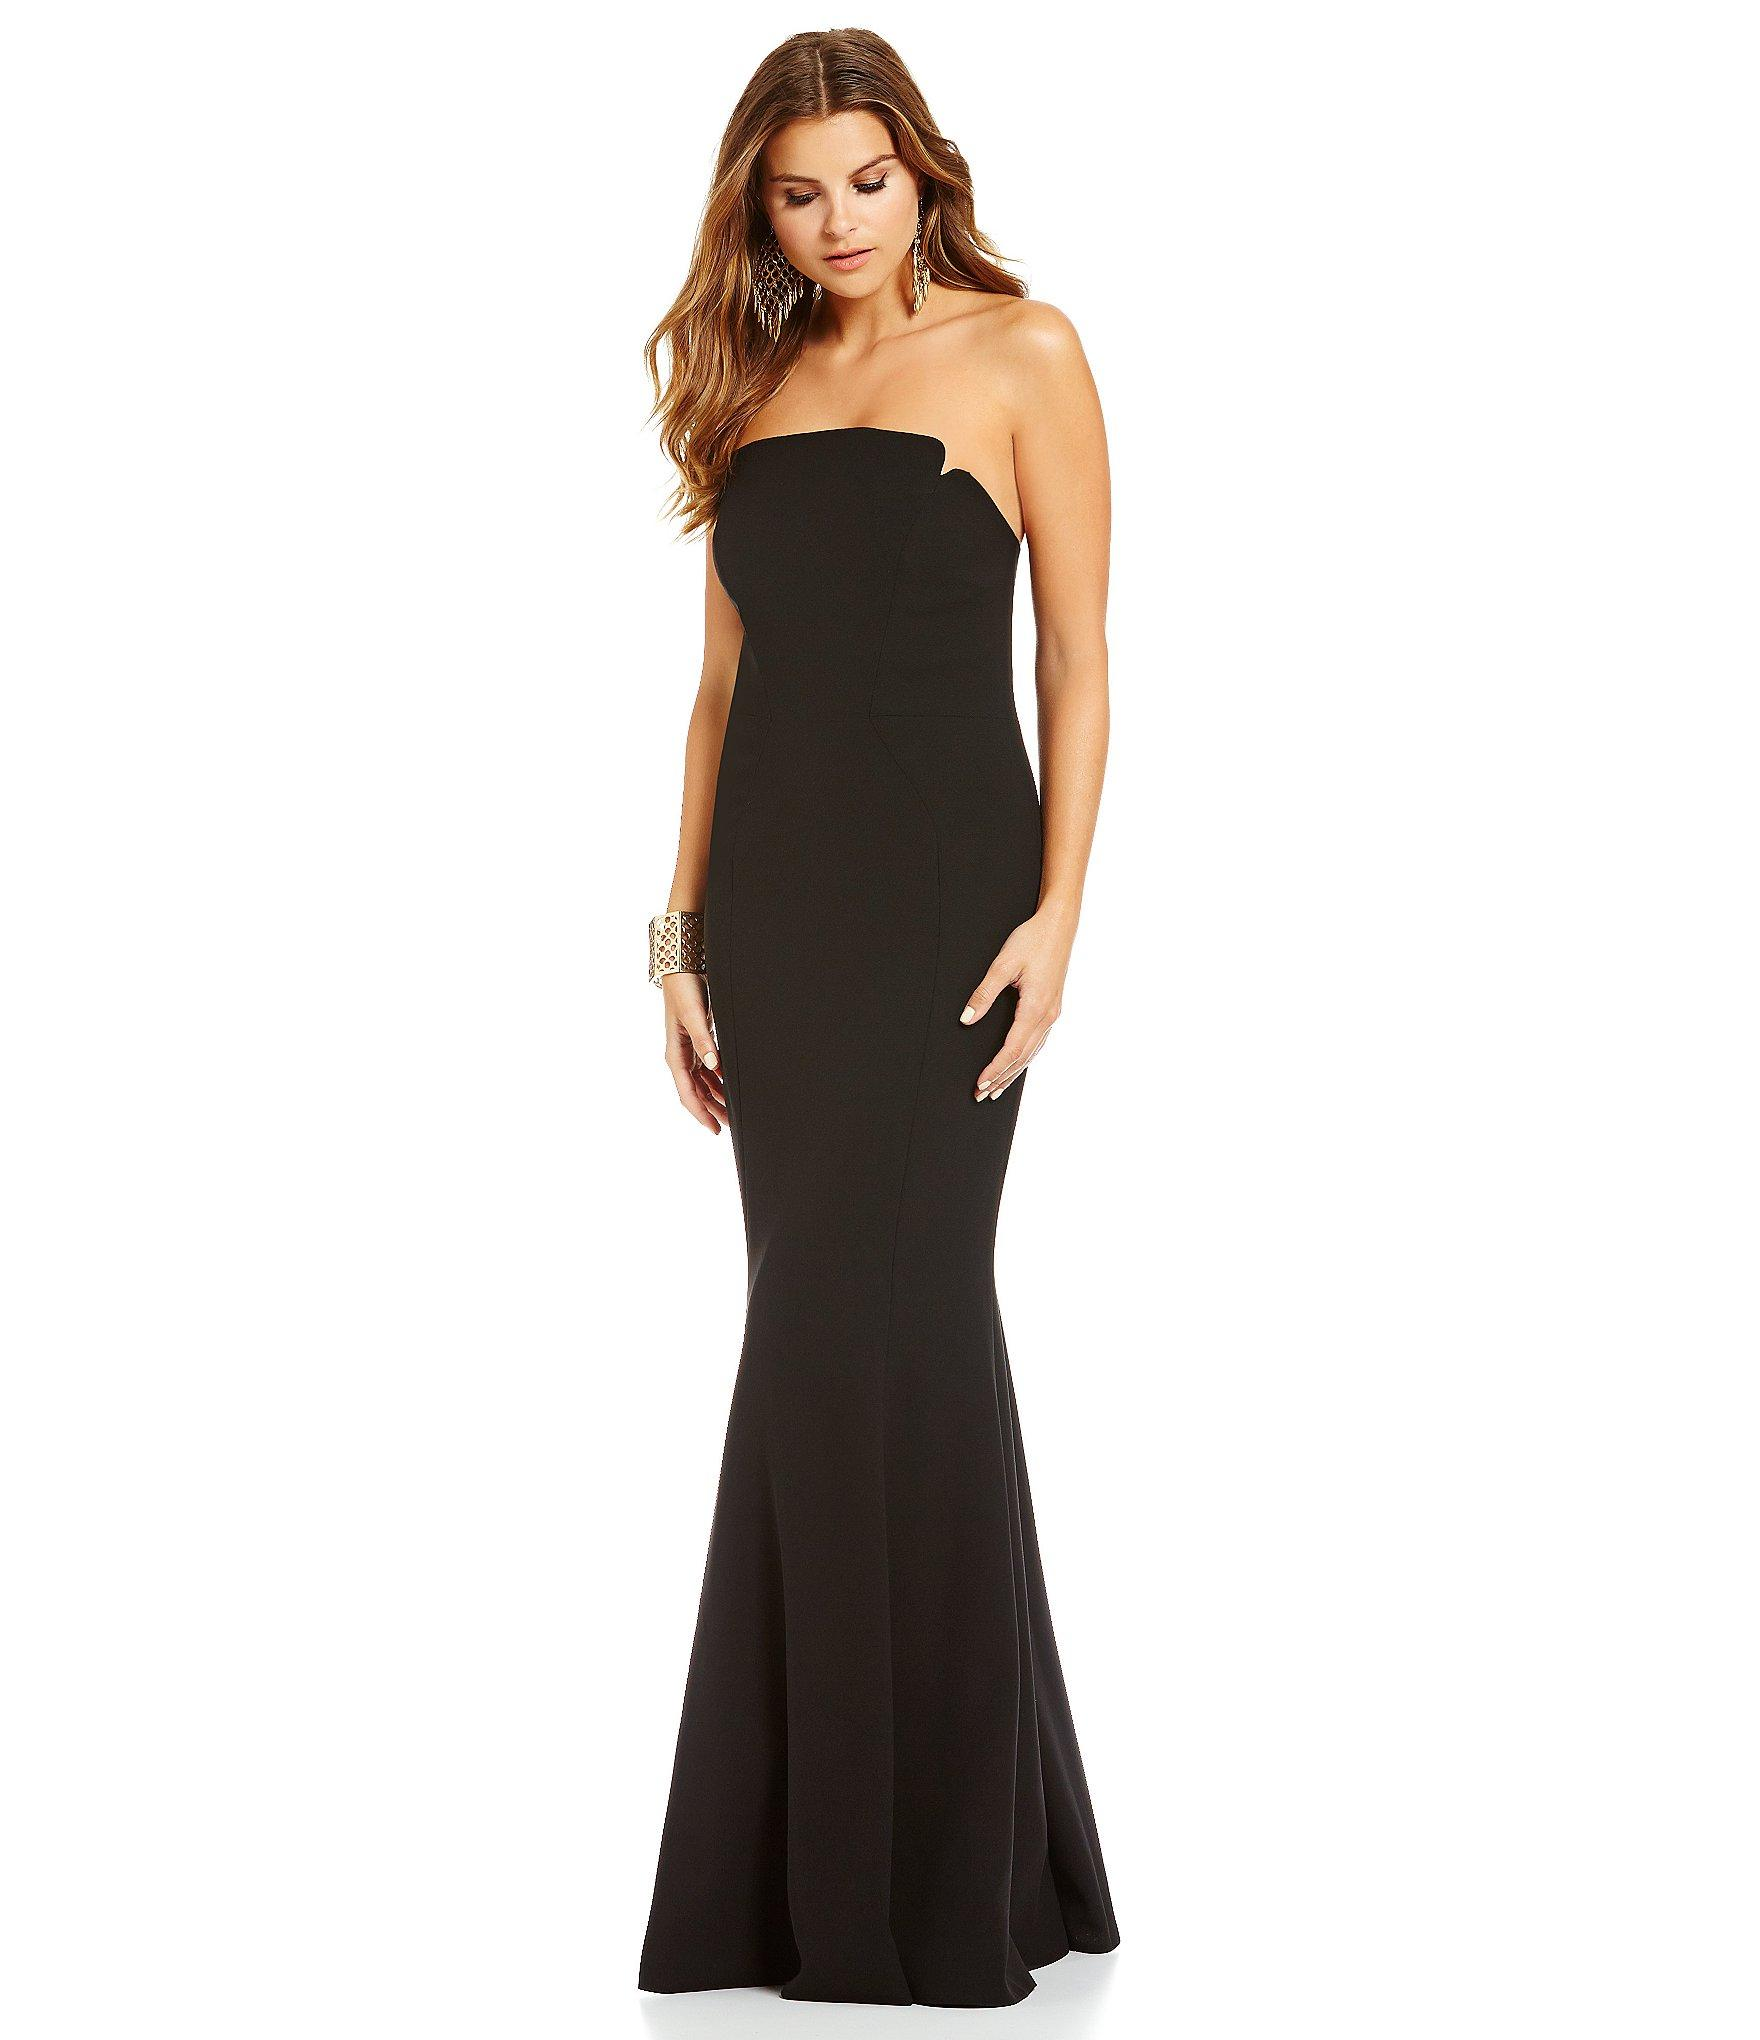 Jill Jill Stuart Long Strapless Fitted Gown In Black